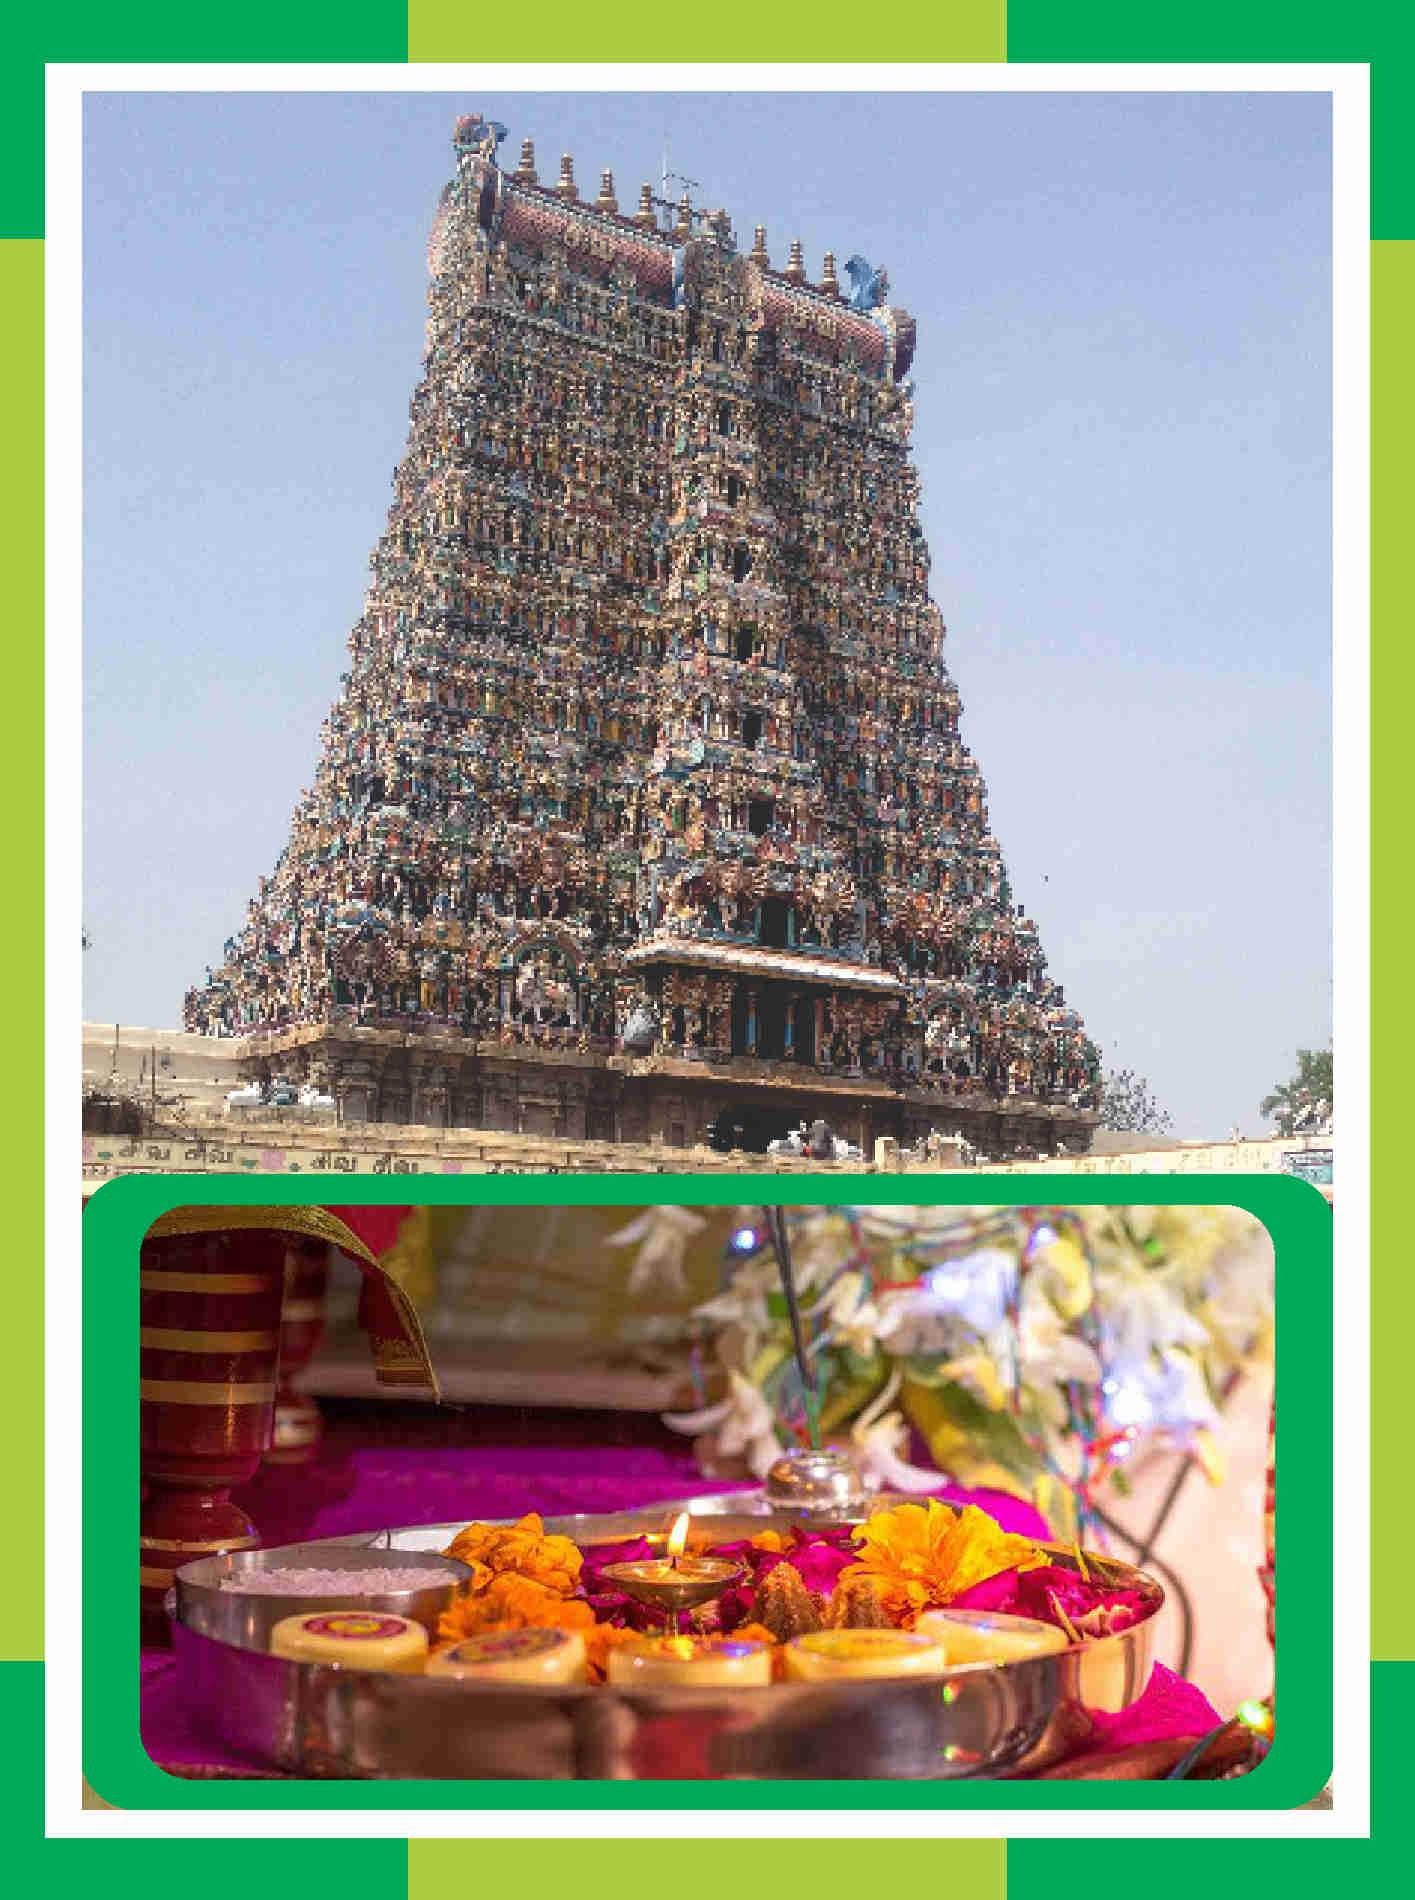 Madurai Meenakashi - Spl Parihara Puja for Moolam Star